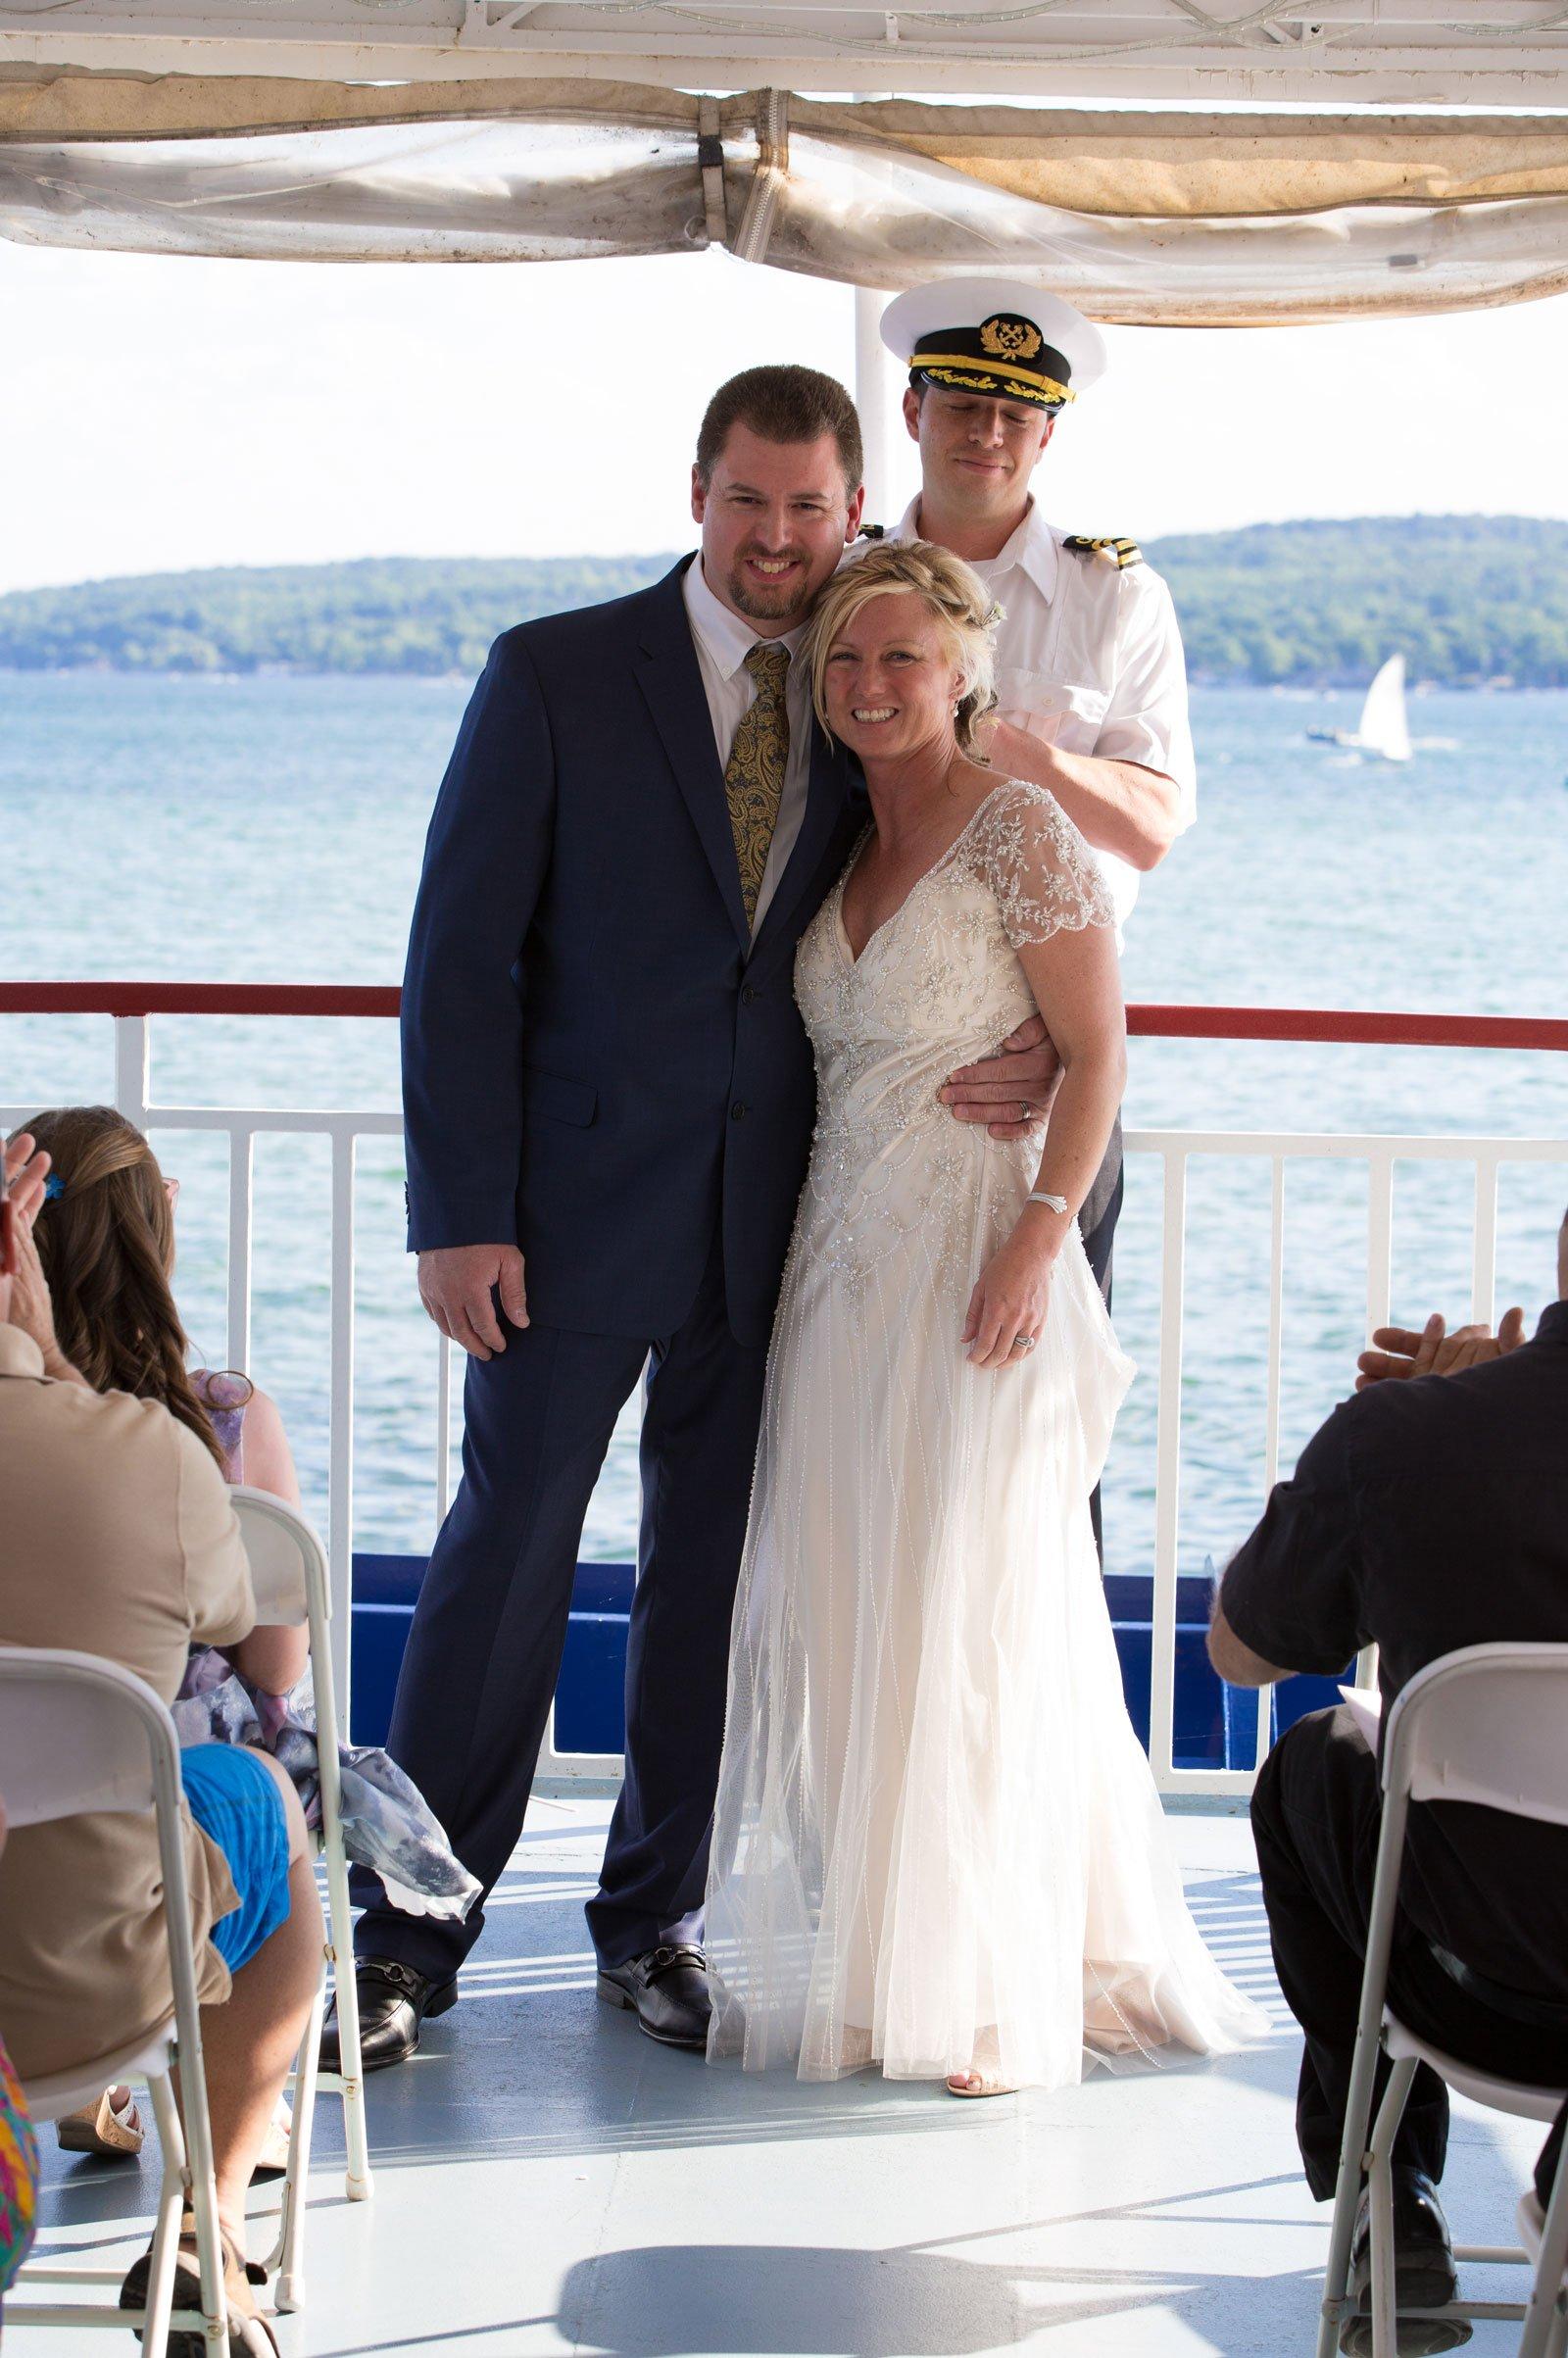 Canandaigua NY Wedding Ceremony Bride Groom just married